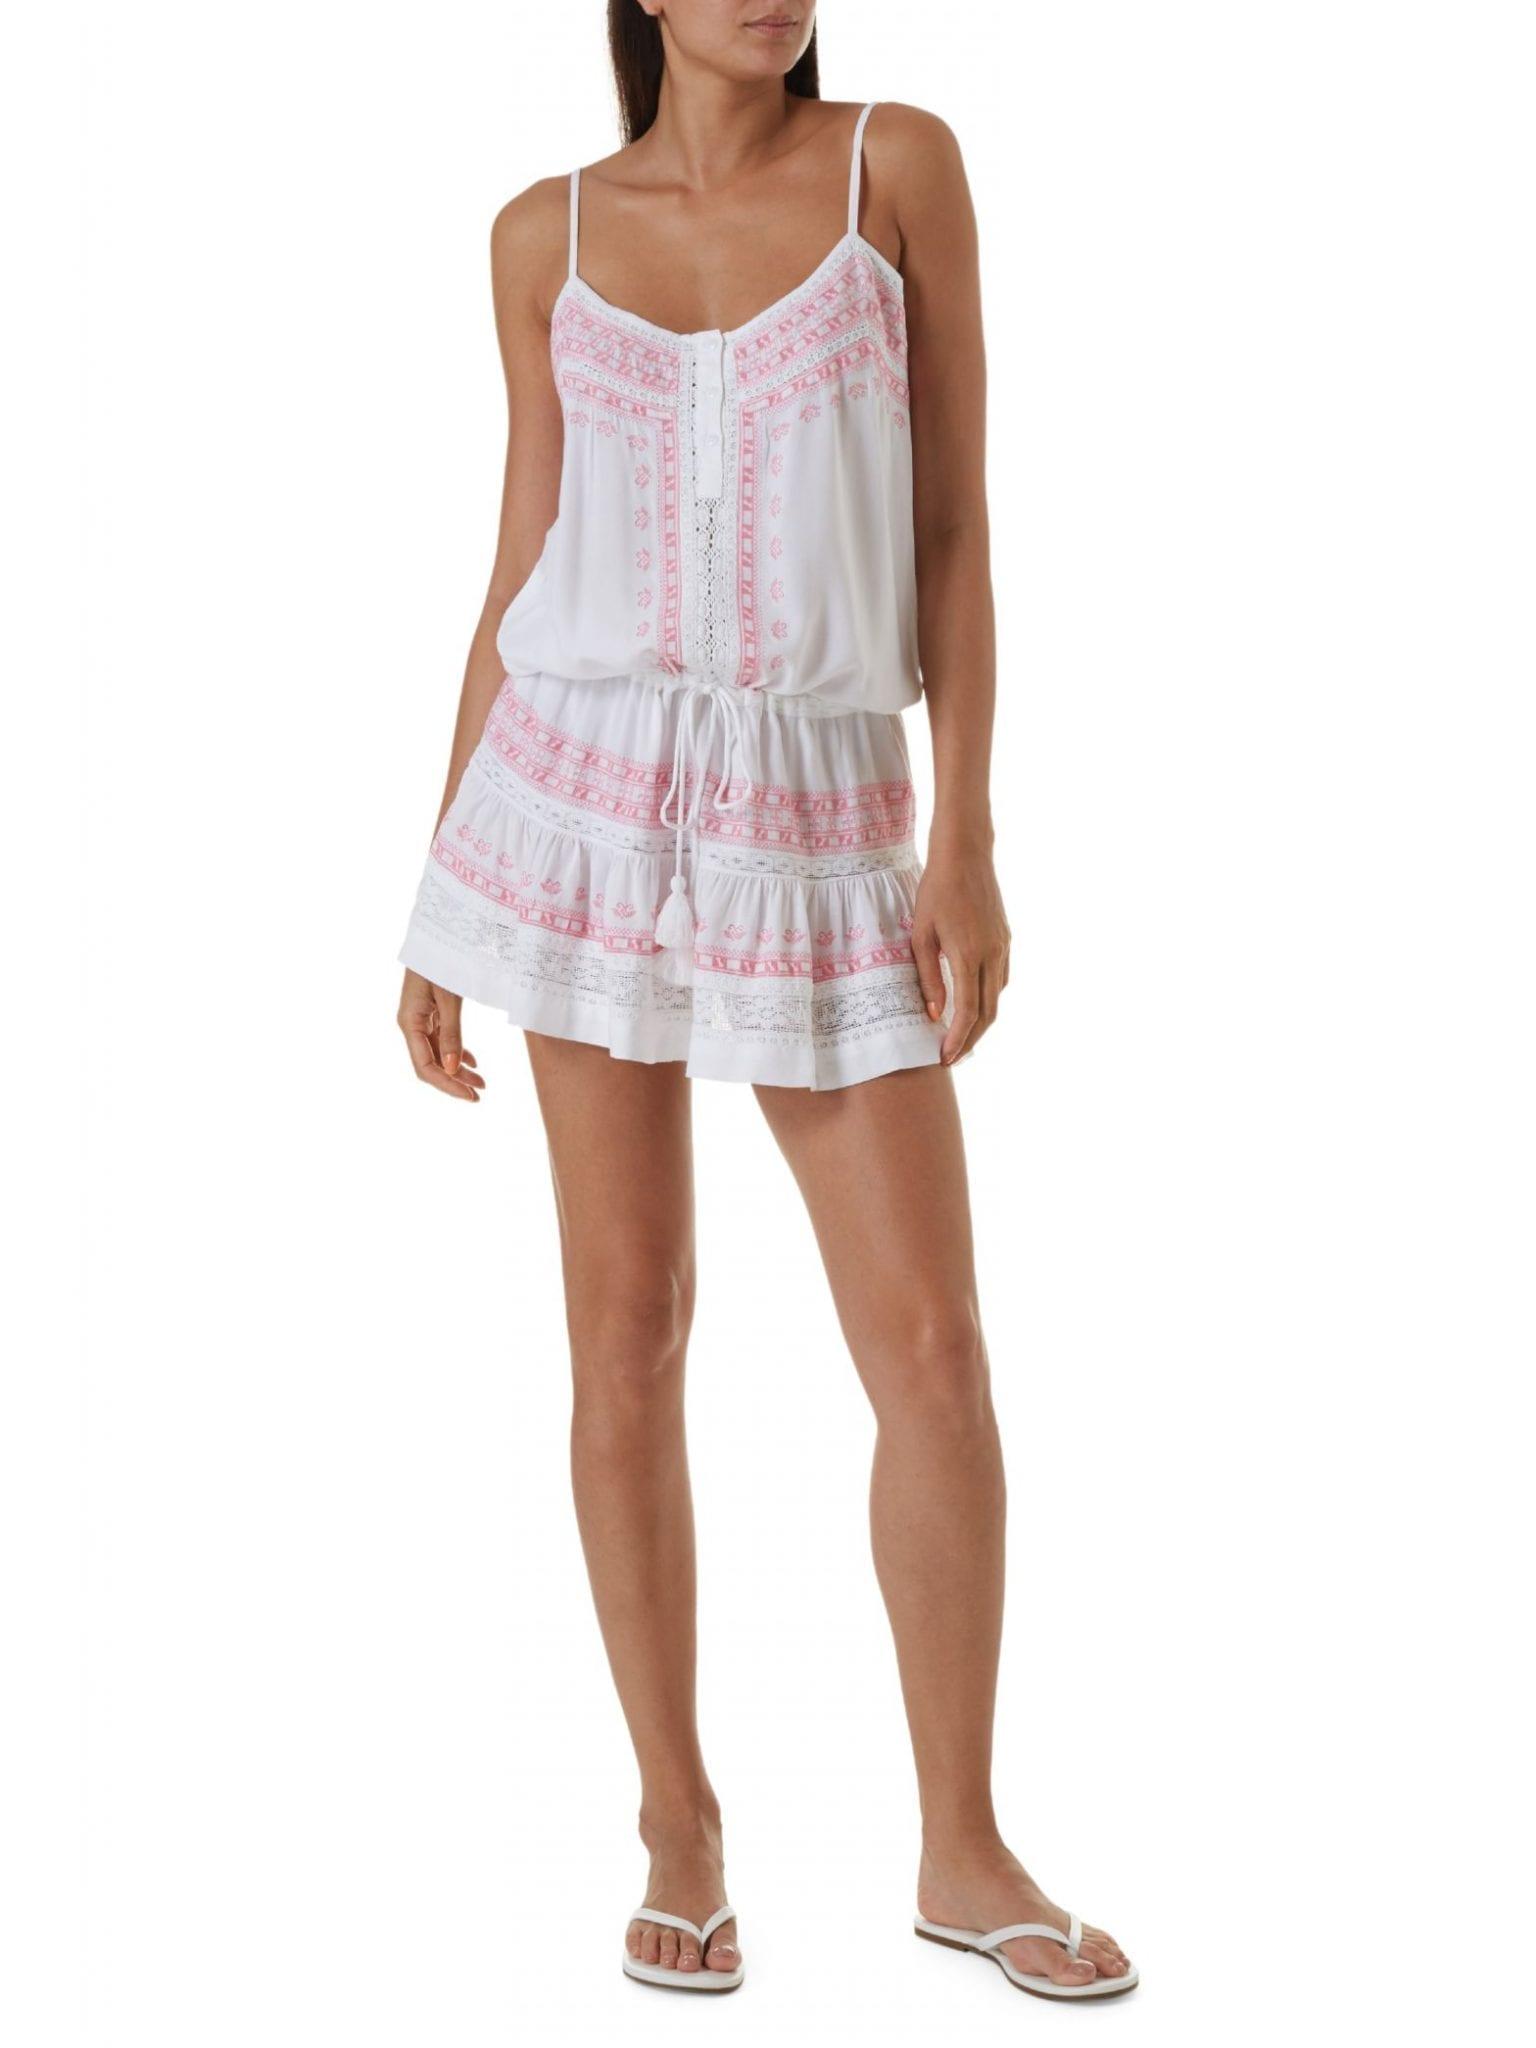 MELISSA ODABASH High Summer Karen Mini Dress